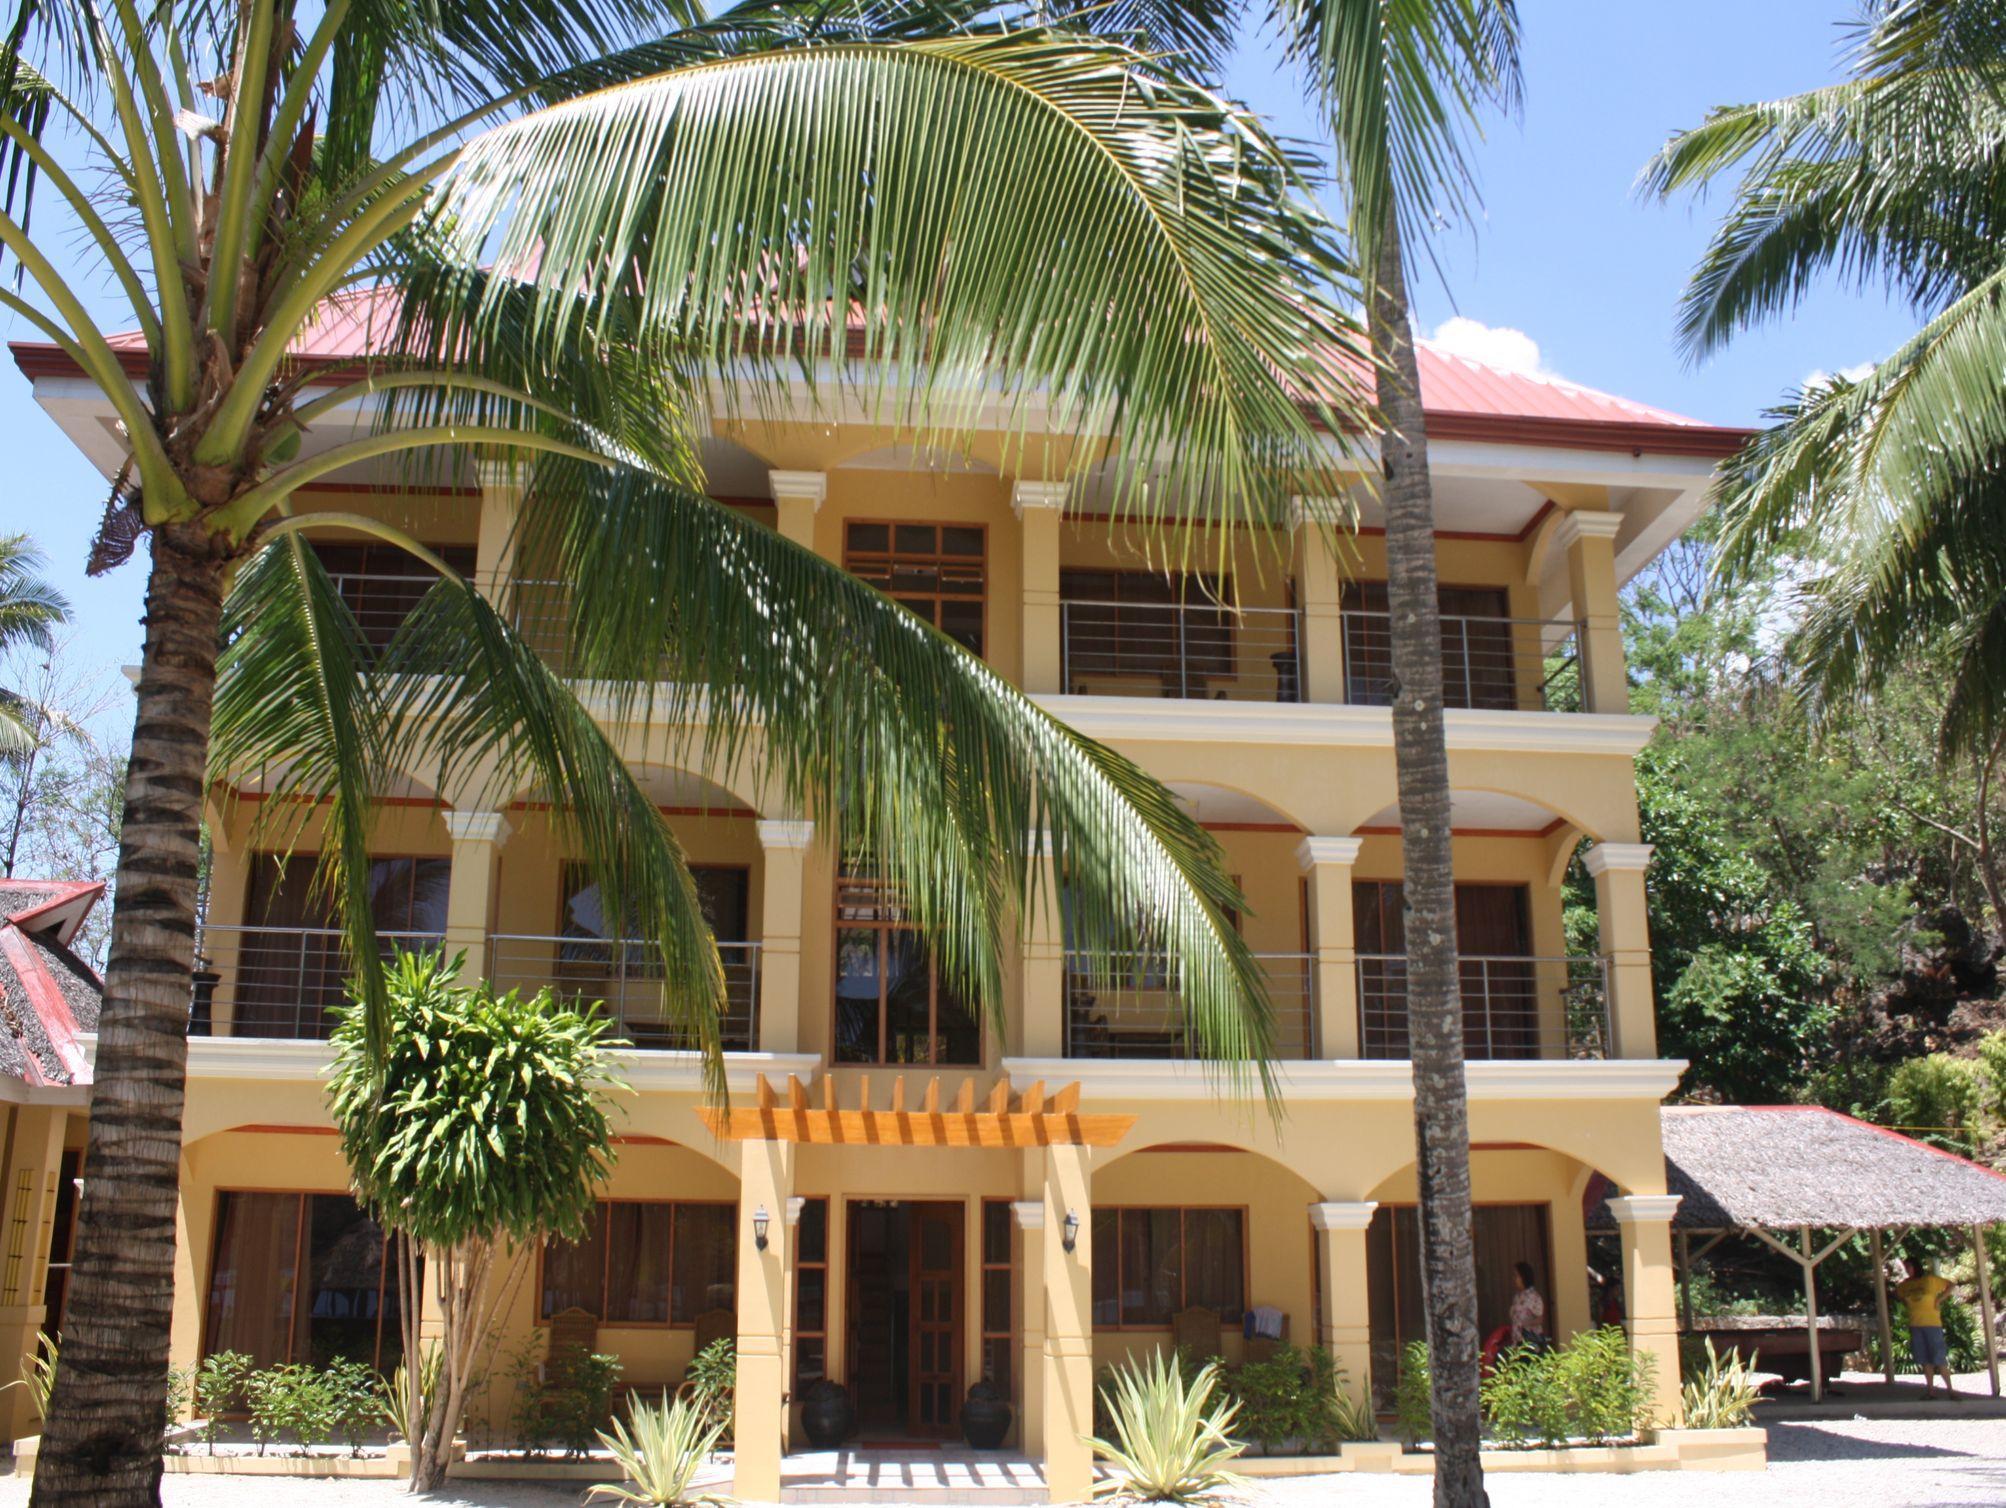 Cabaling Beach Resort Jordan Guimaras Island